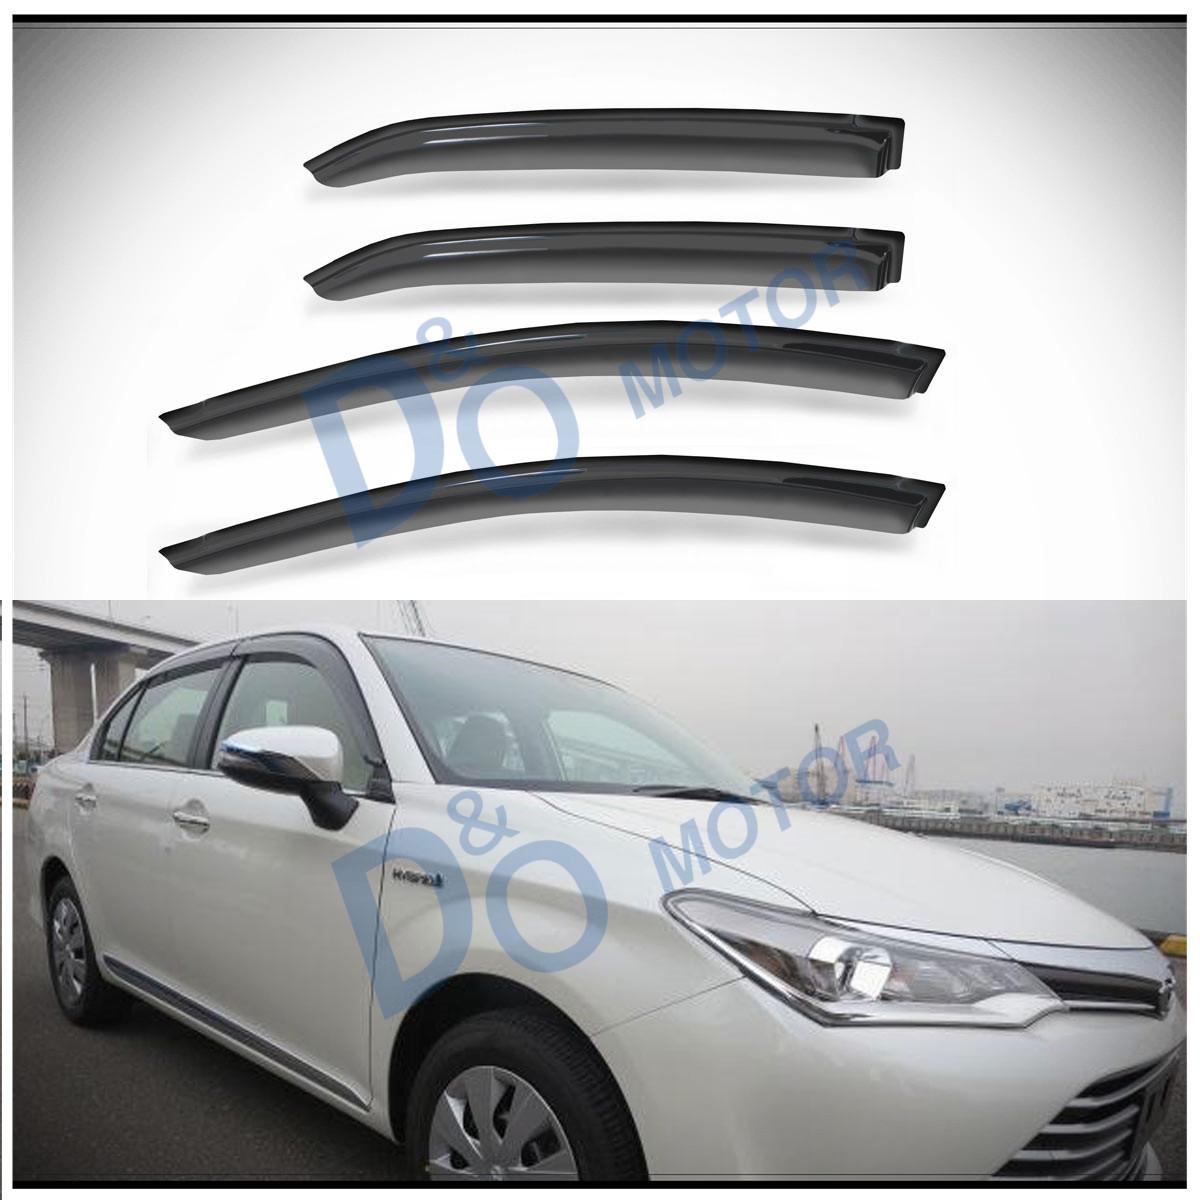 D/&O MOTOR 4pcs Front+Rear Smoke Sun//Rain Guard Outside Mount Tape-On Window Visors For 09-13 Toyota Corolla